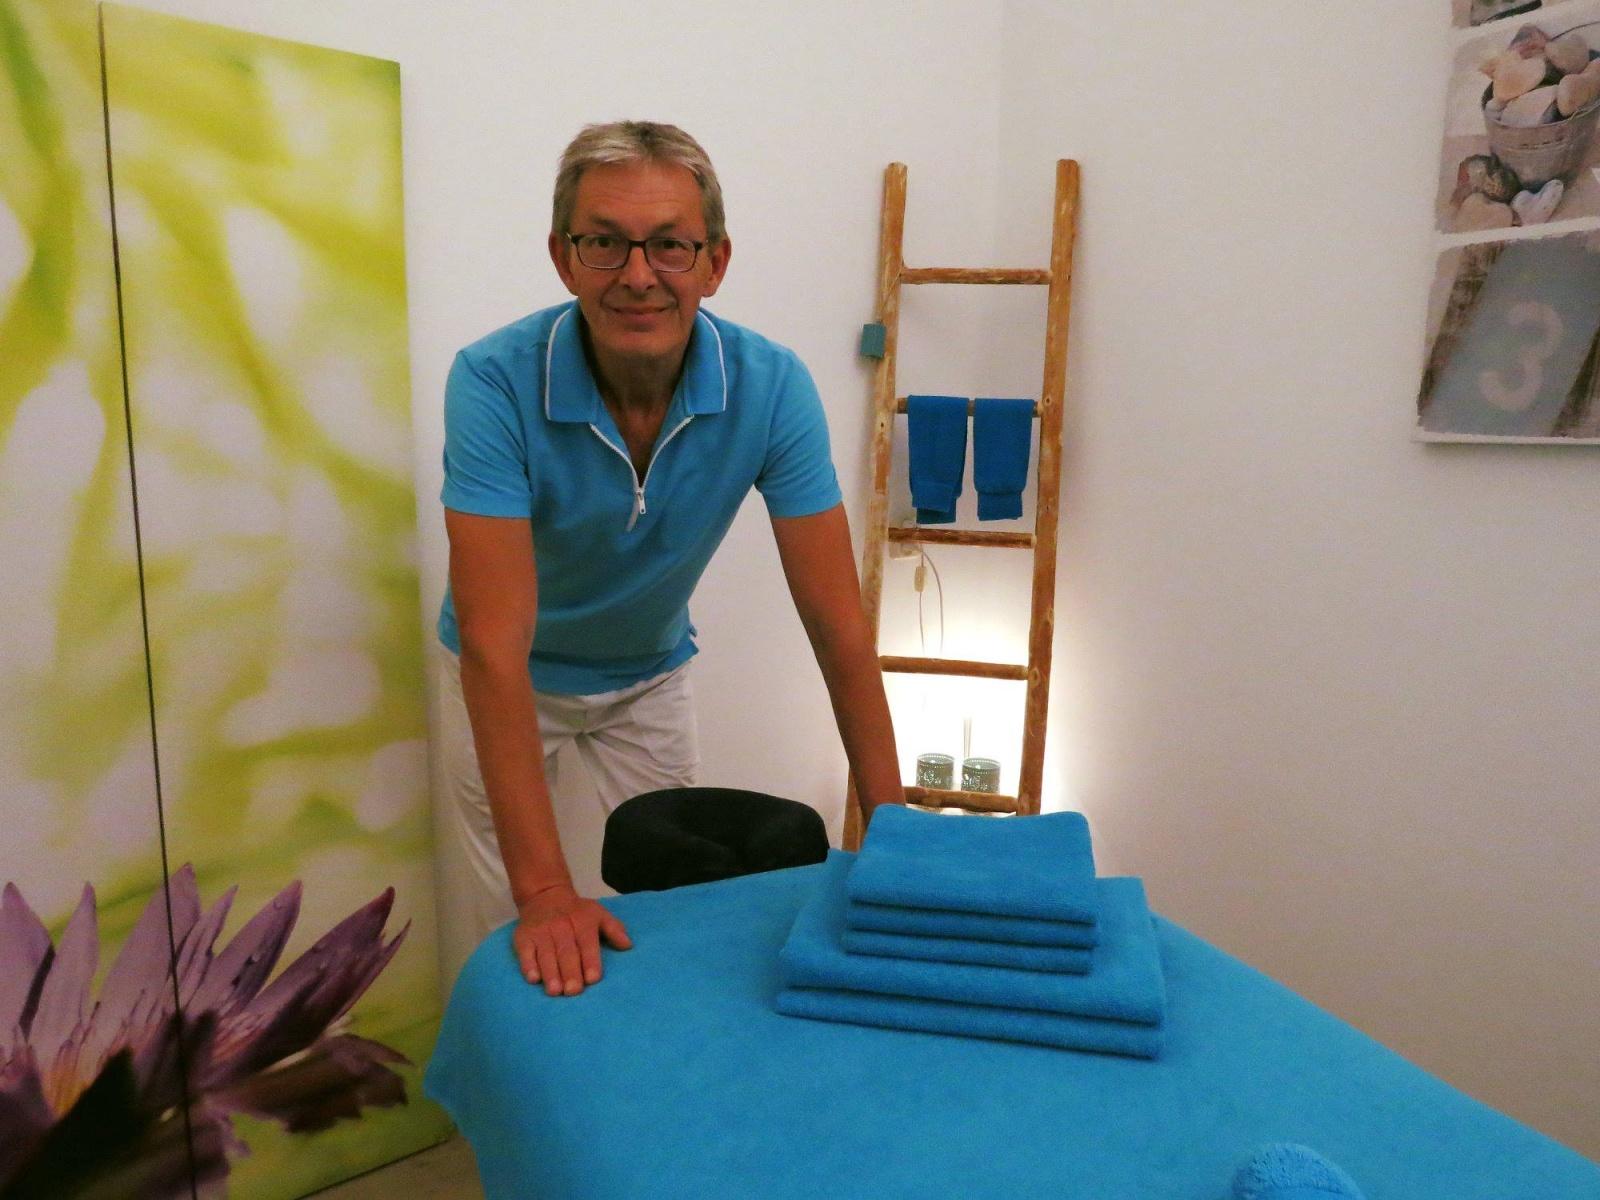 ontspanningsmassage welnessmassage Gerard van Heck